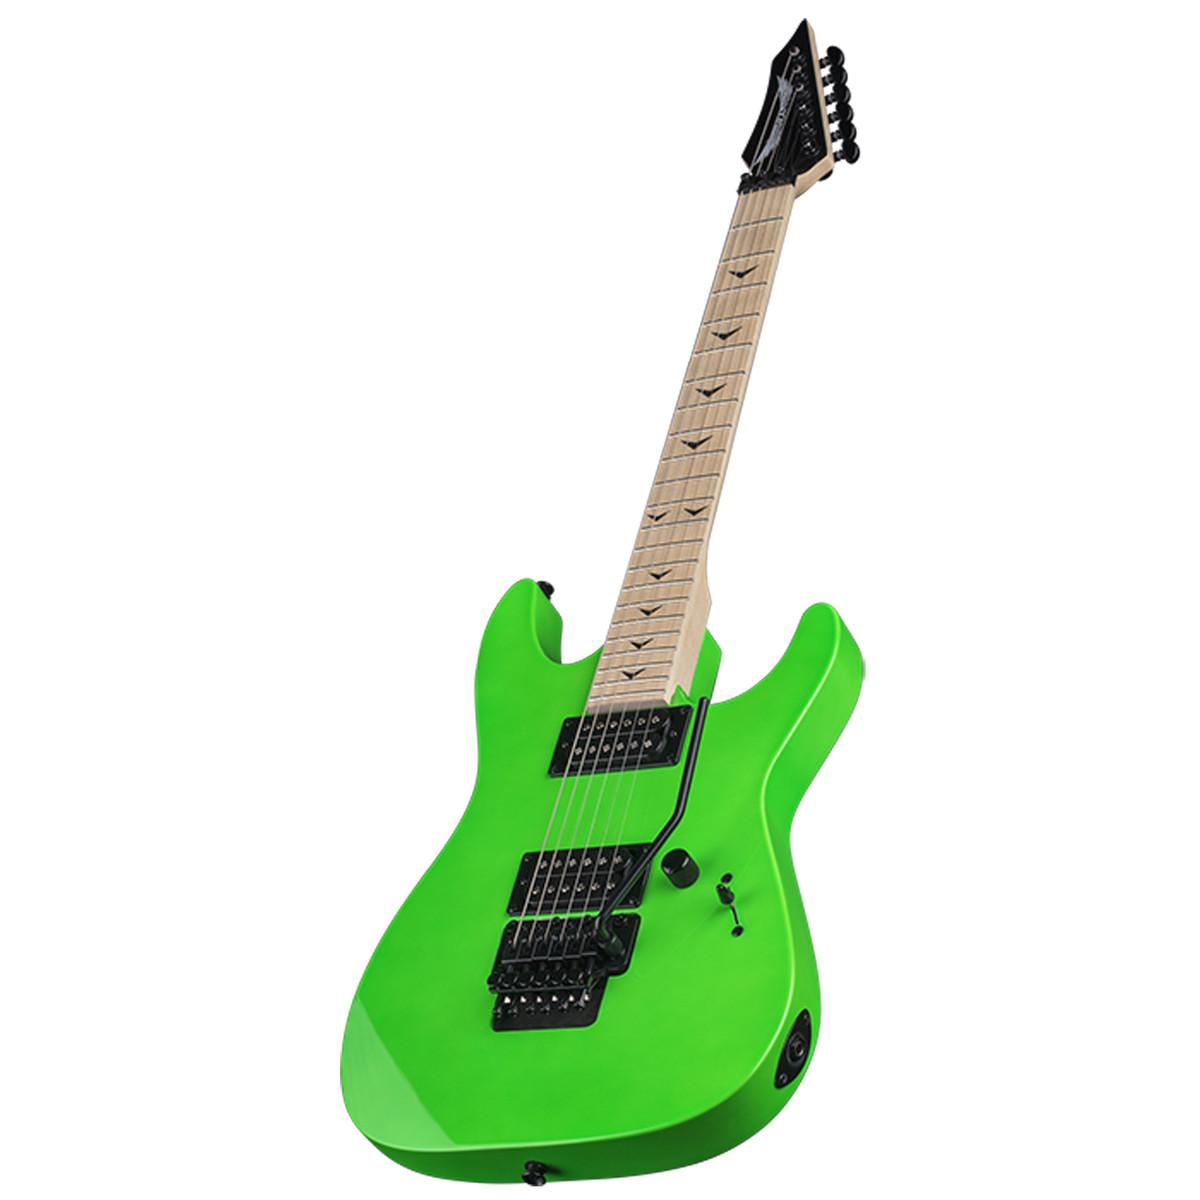 disc dean custom zone ii floyd electric guitar nuclear green at gear4music. Black Bedroom Furniture Sets. Home Design Ideas